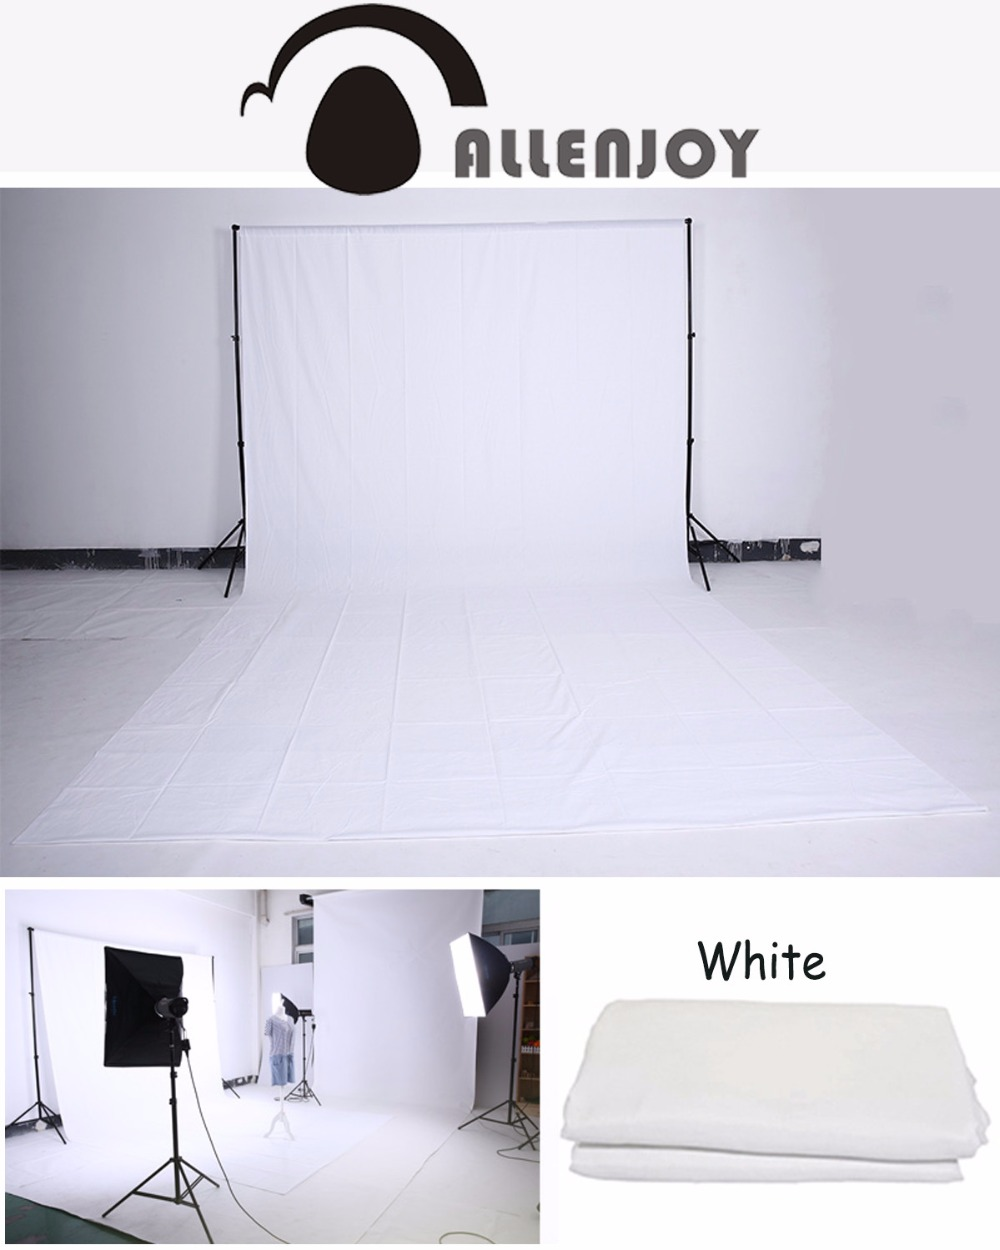 Allenjoy Hromakey Green Screen Background Chromakey Muslin Backdrop For Video Customized Size Professional Photo Lighting Studio